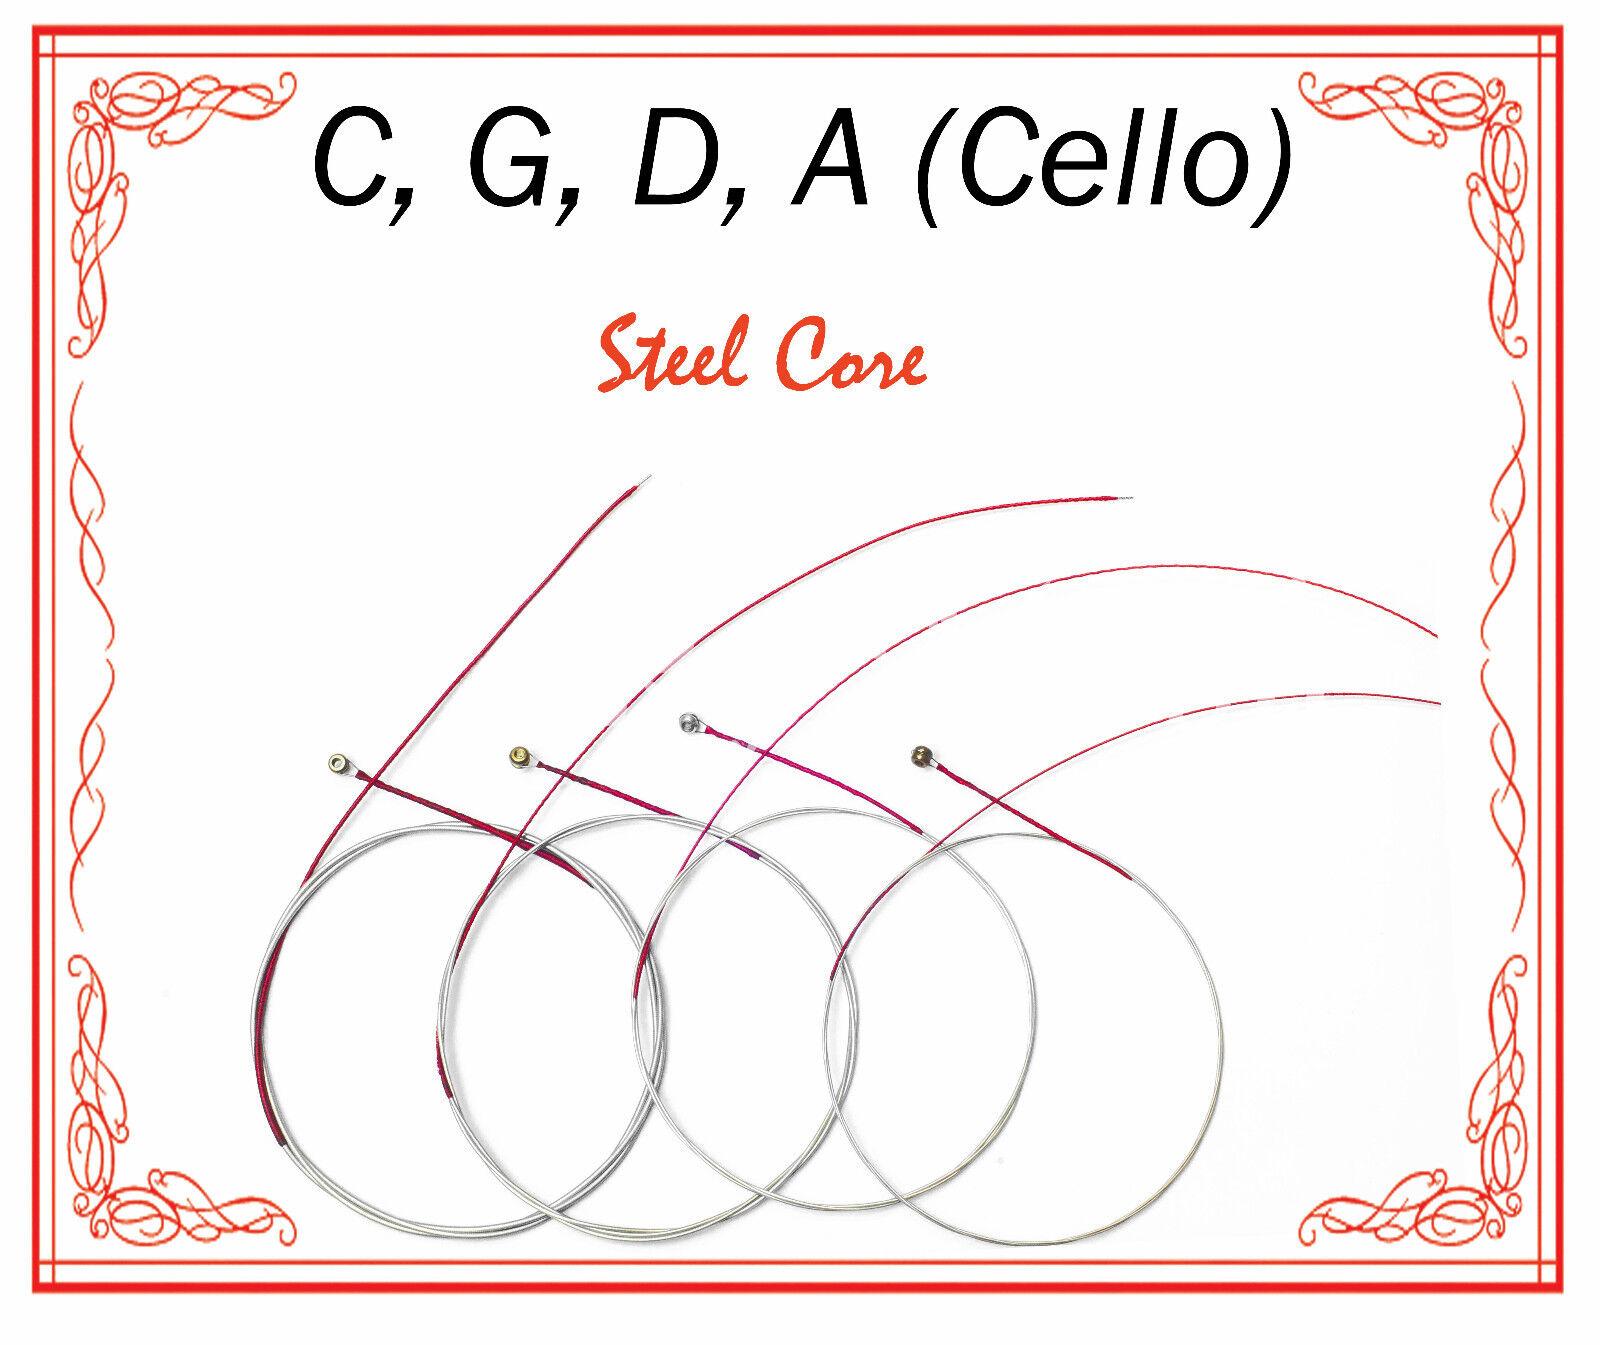 Paititi String Steel Core Beginner Level String Set 1/4 Größe Cello High Quality